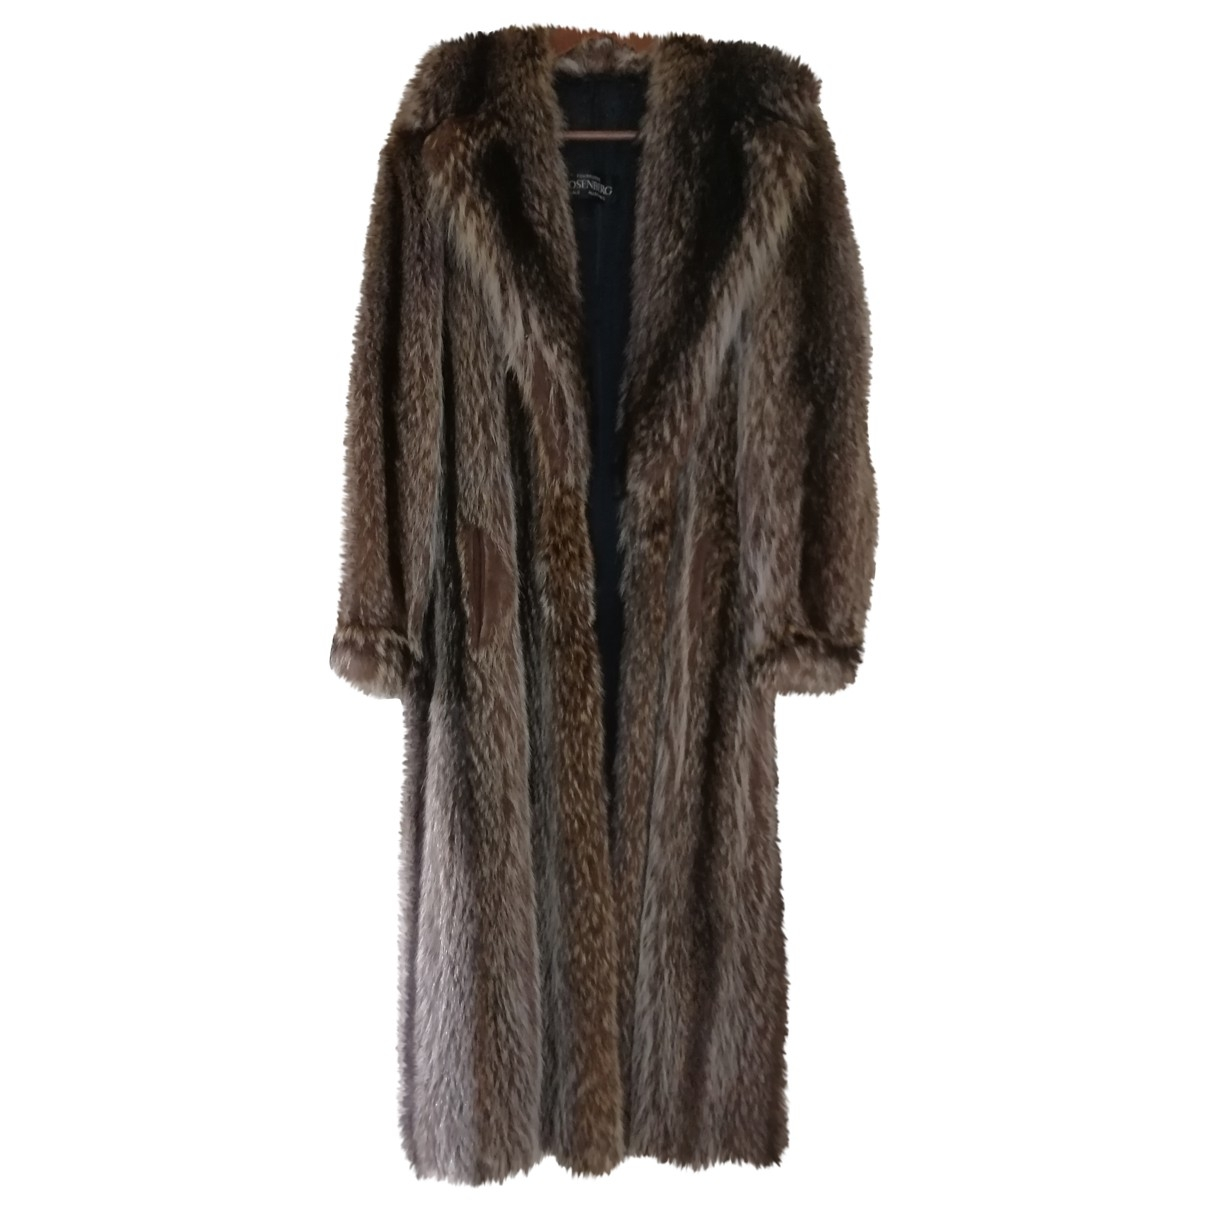 Rosenberg & Lenhart - Manteau   pour femme en fourrure - marron